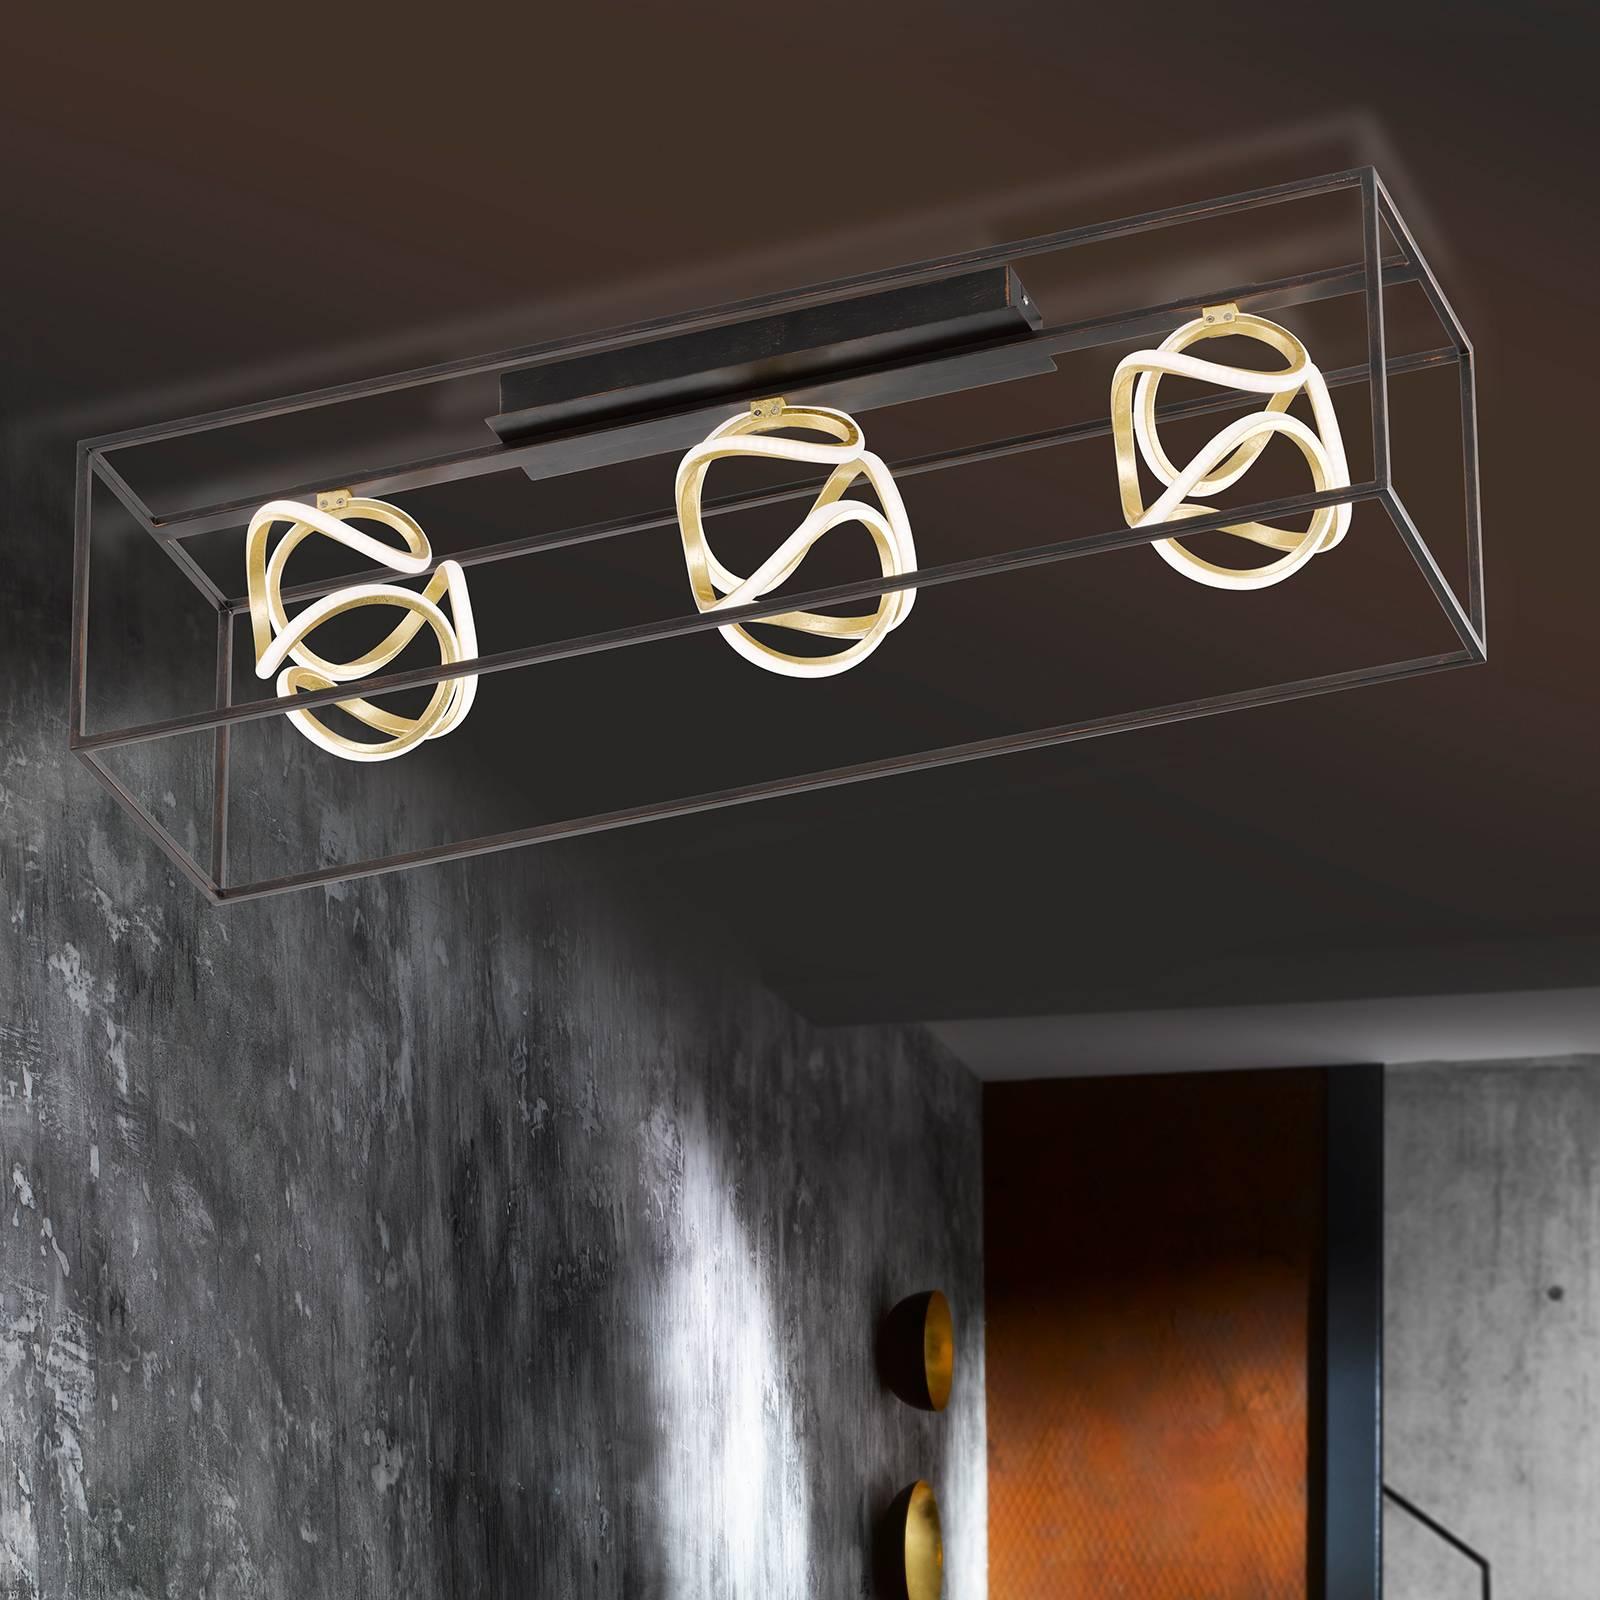 LED-kattovalaisin Gesa metallikehikolla